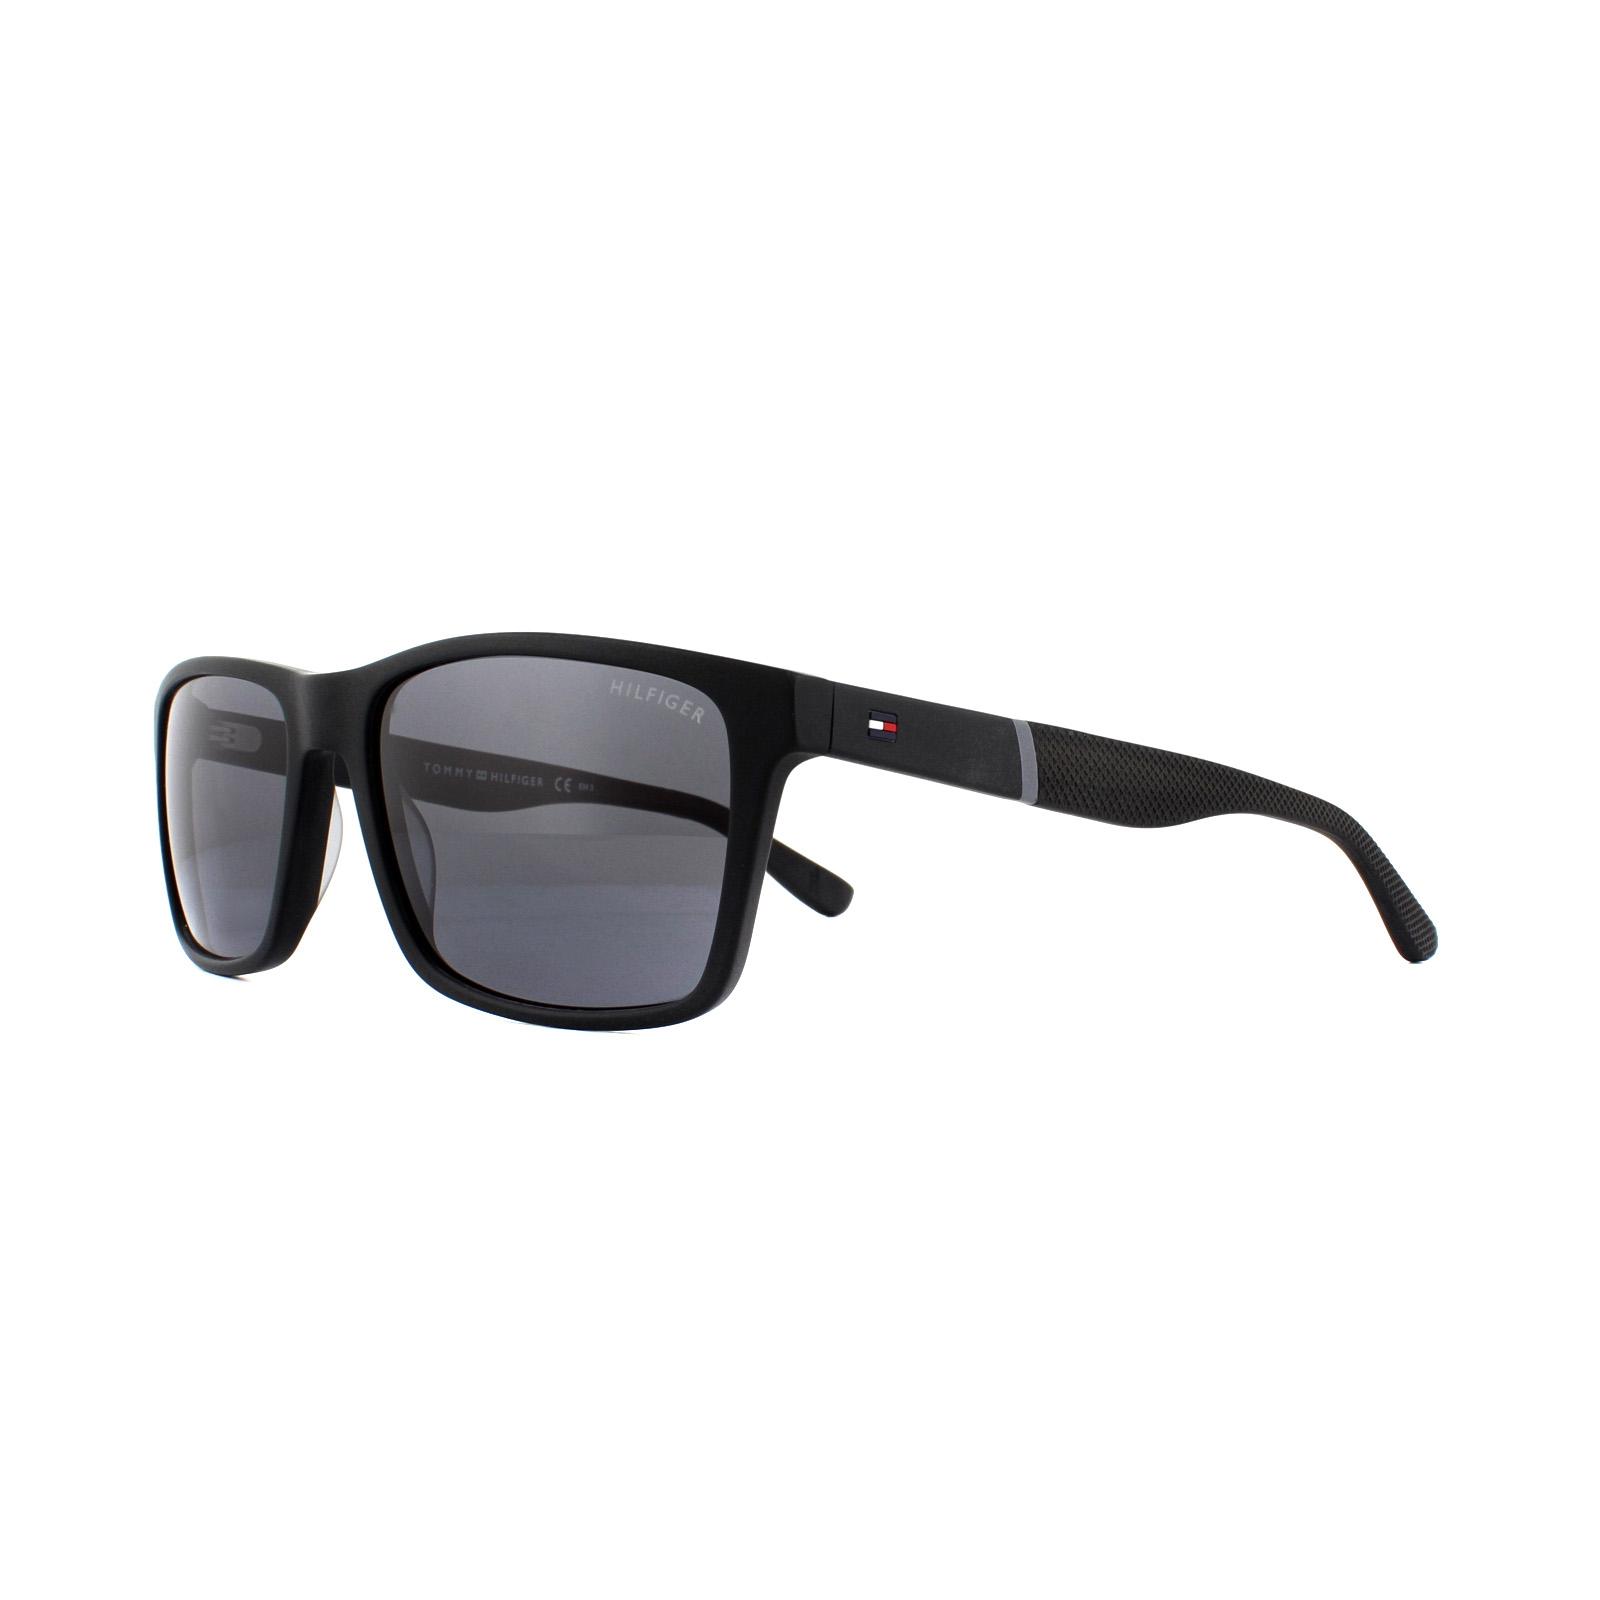 1713fad20fb5e Sentinel Tommy Hilfiger Sunglasses TH 1405 S KUN P9 Black Matte Black Grey